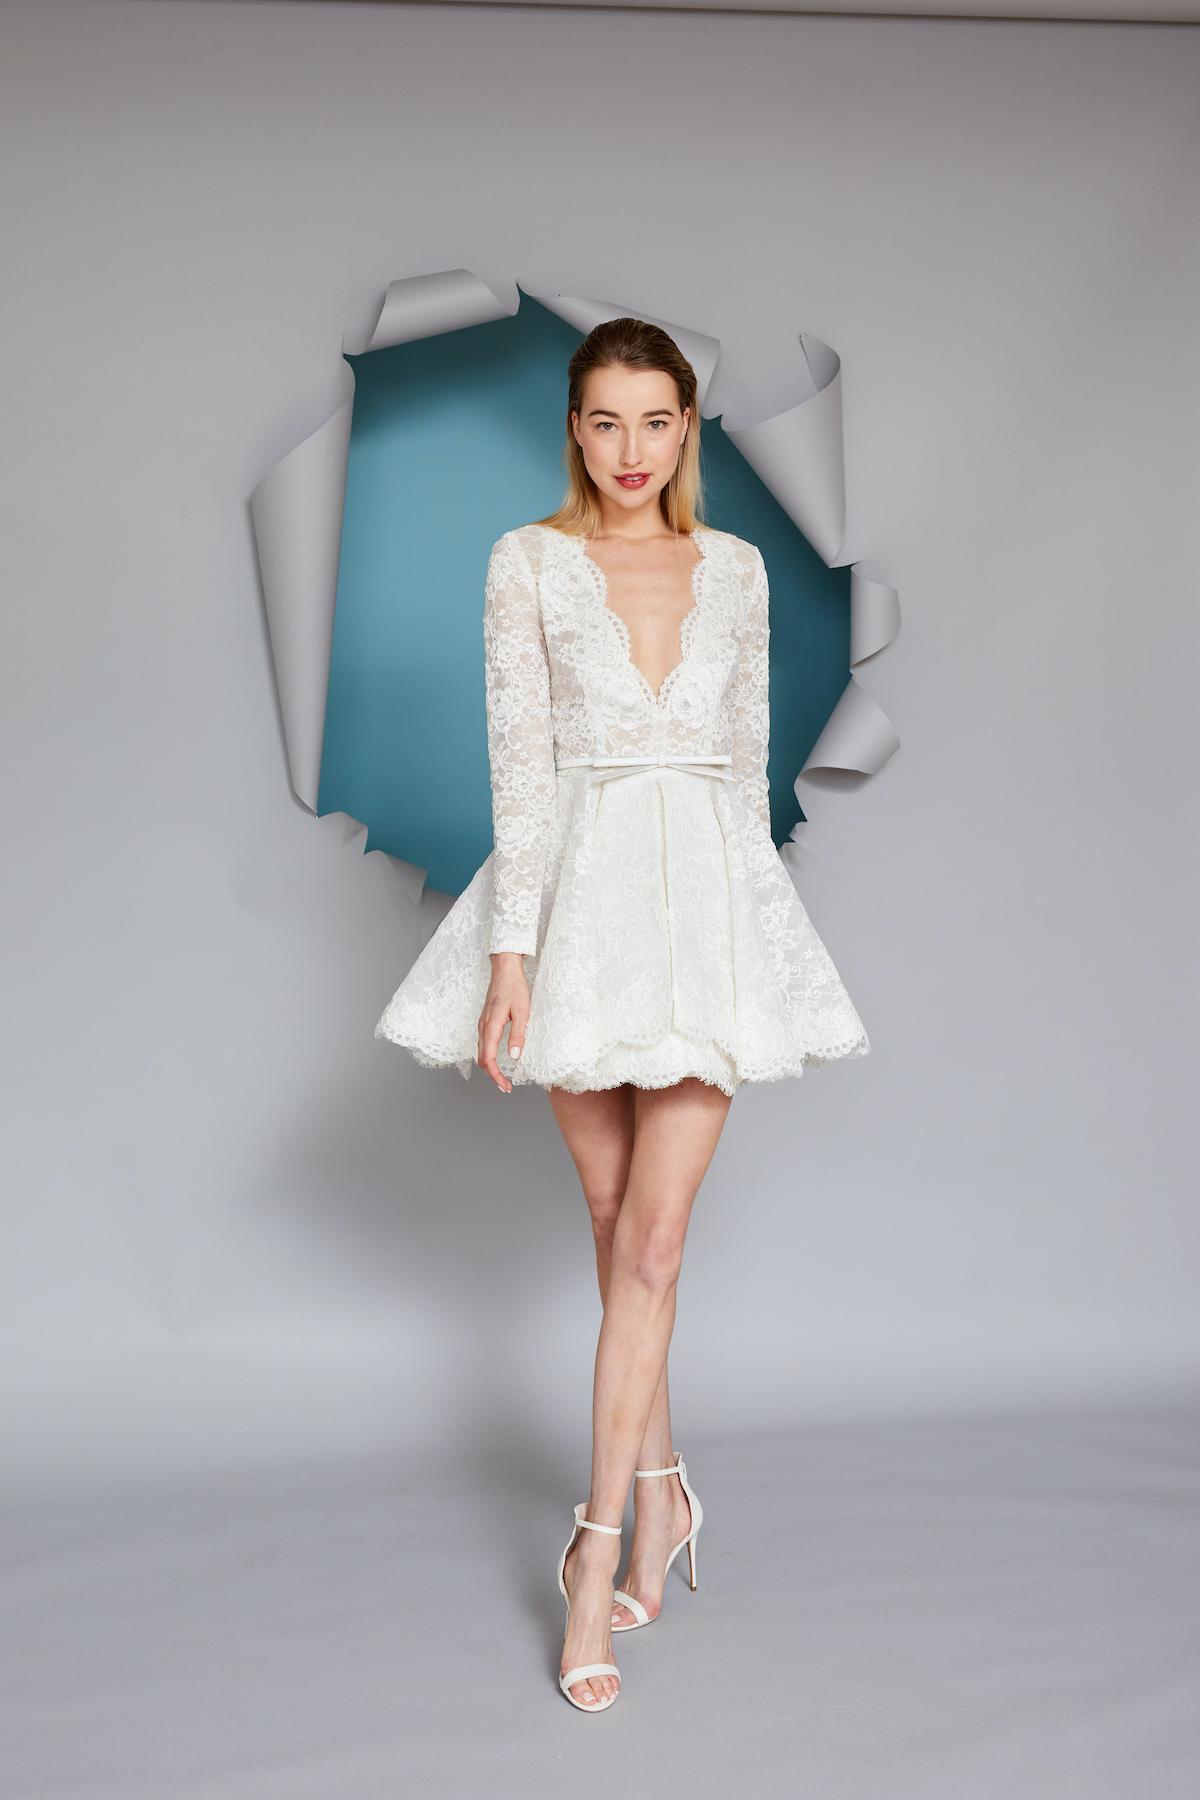 Short, long-sleeved v-neck wedding dress